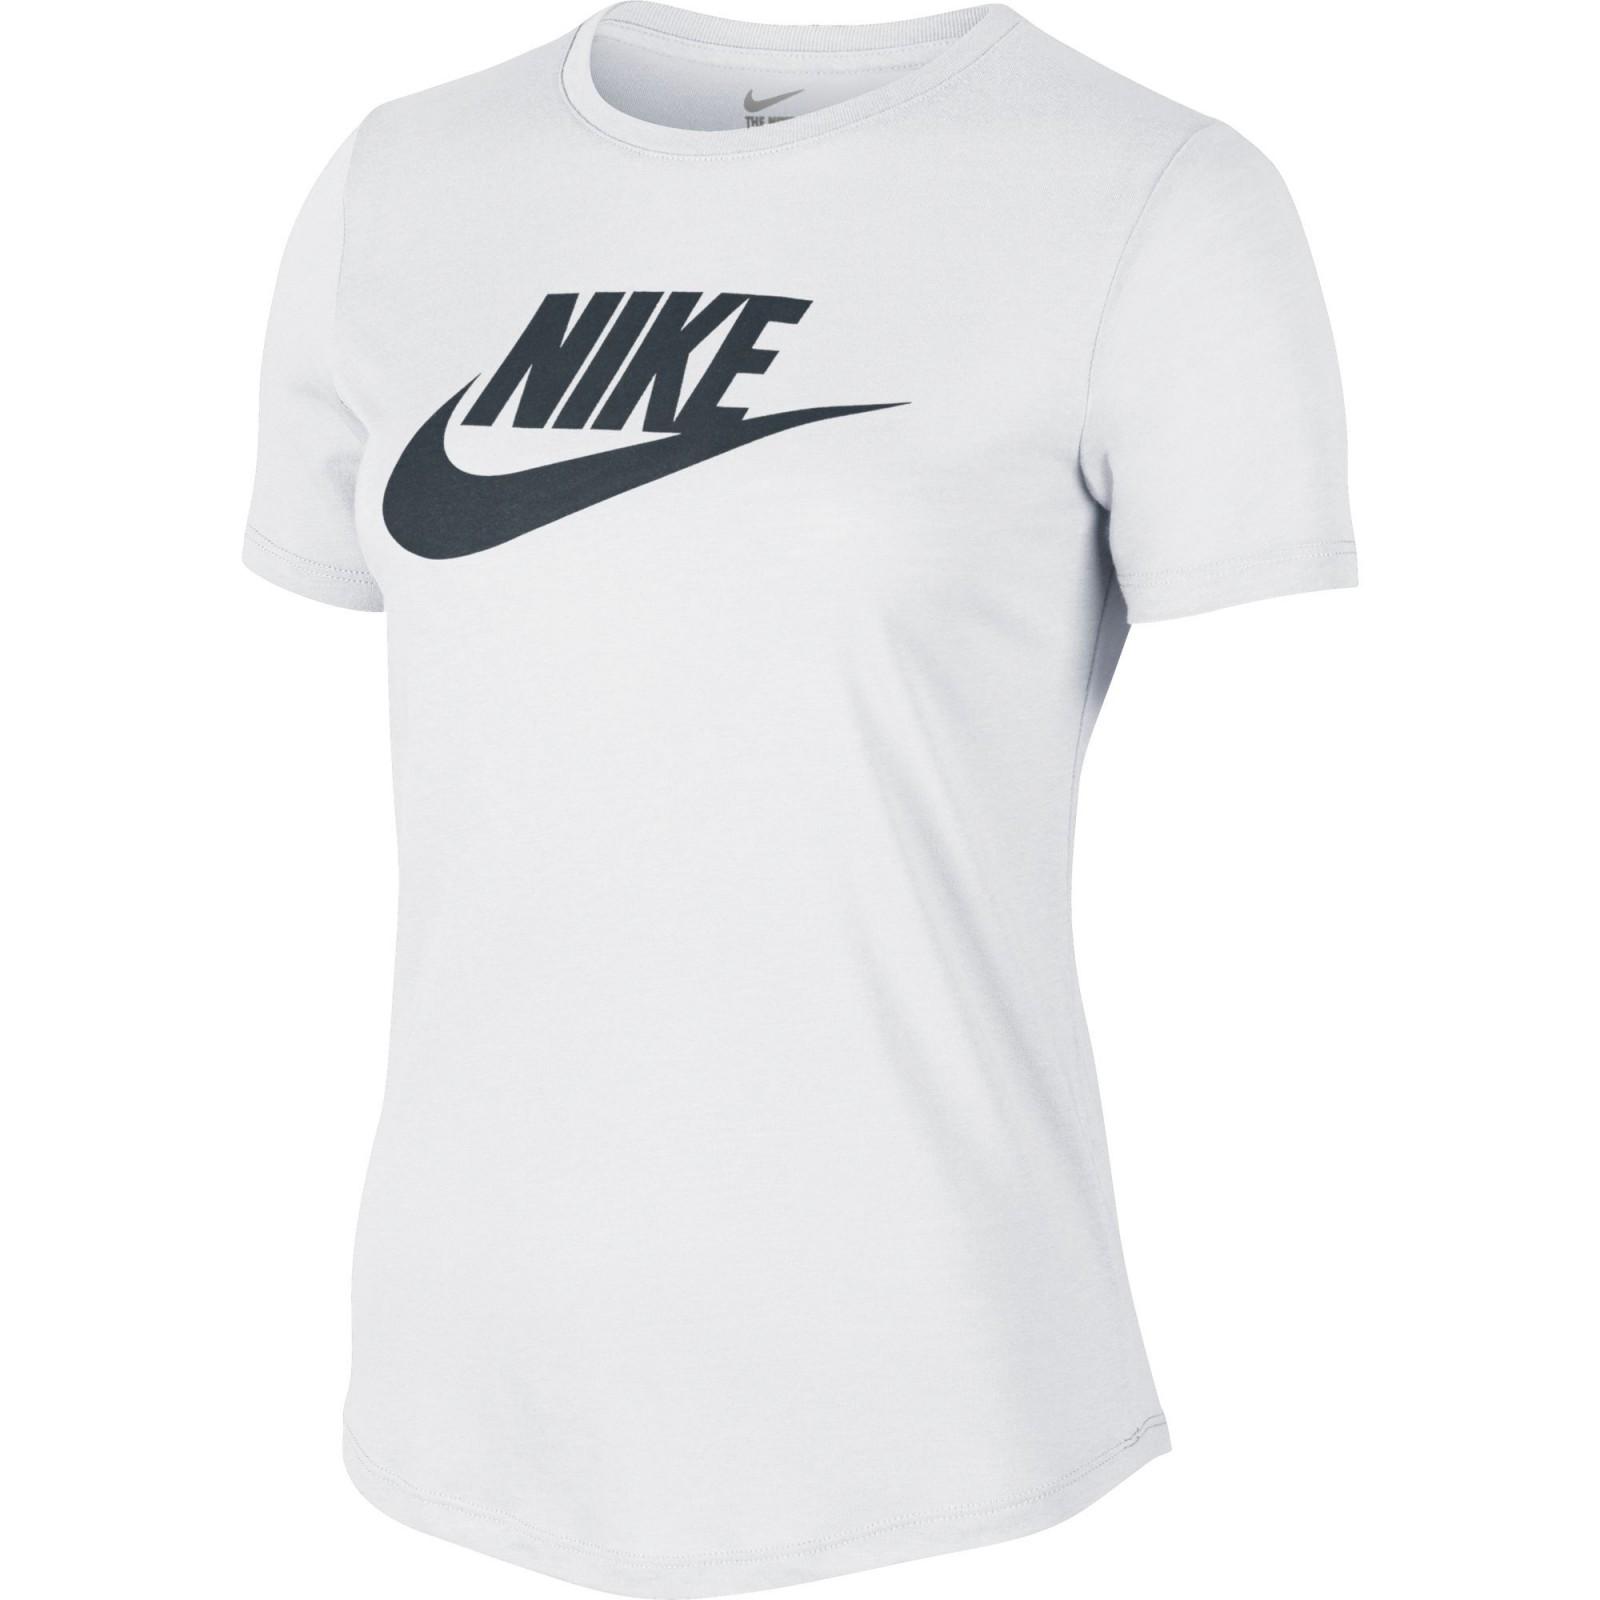 Dámské tričko Nike TEE-ICON FUTURA